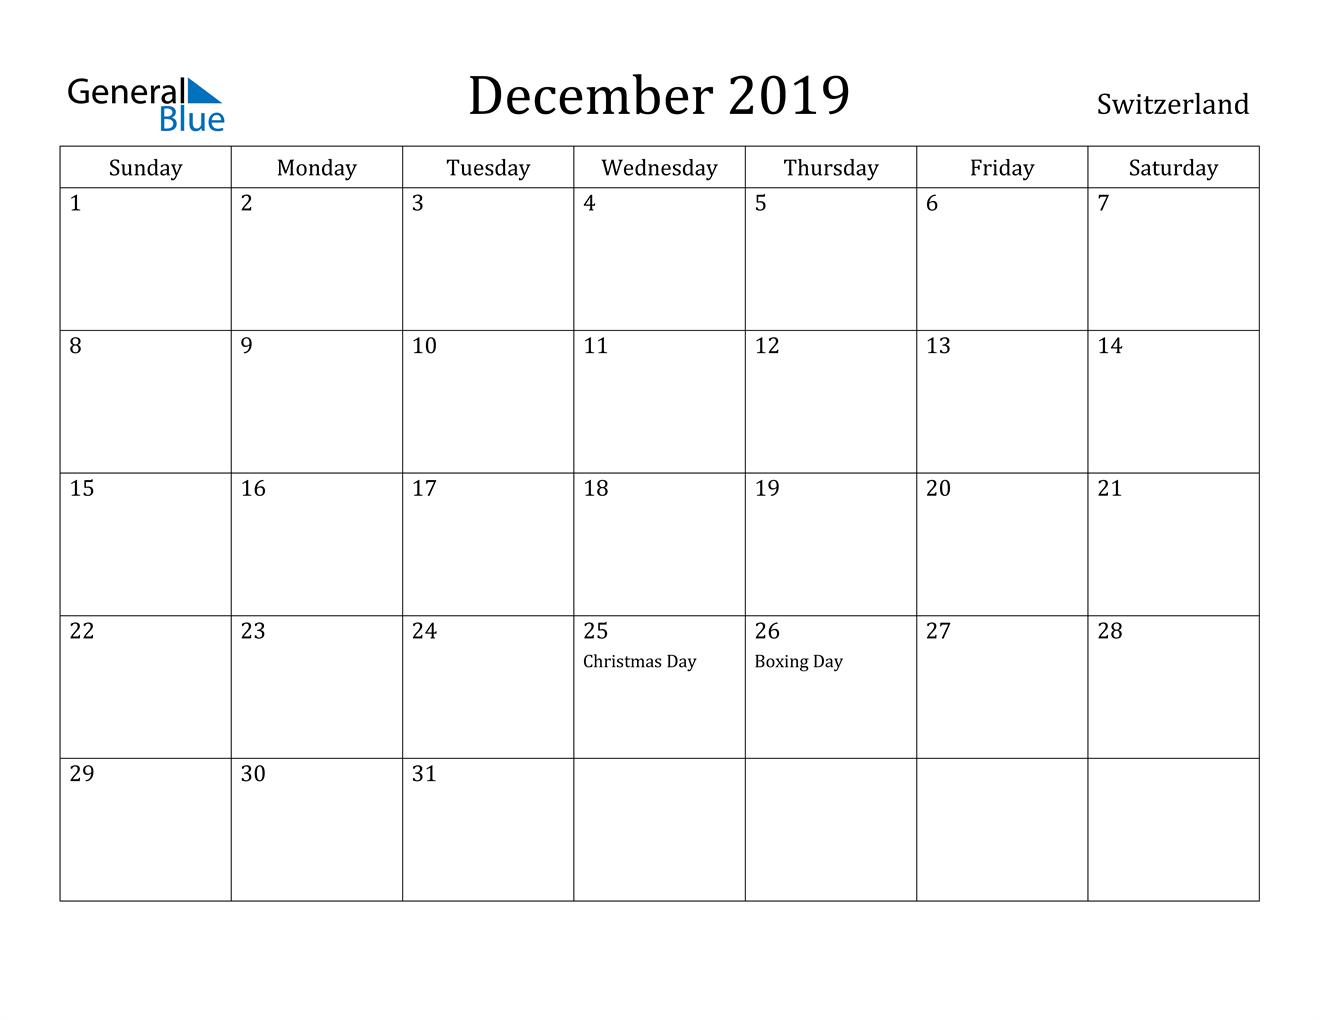 Image of December 2019 Switzerland Calendar with Holidays Calendar